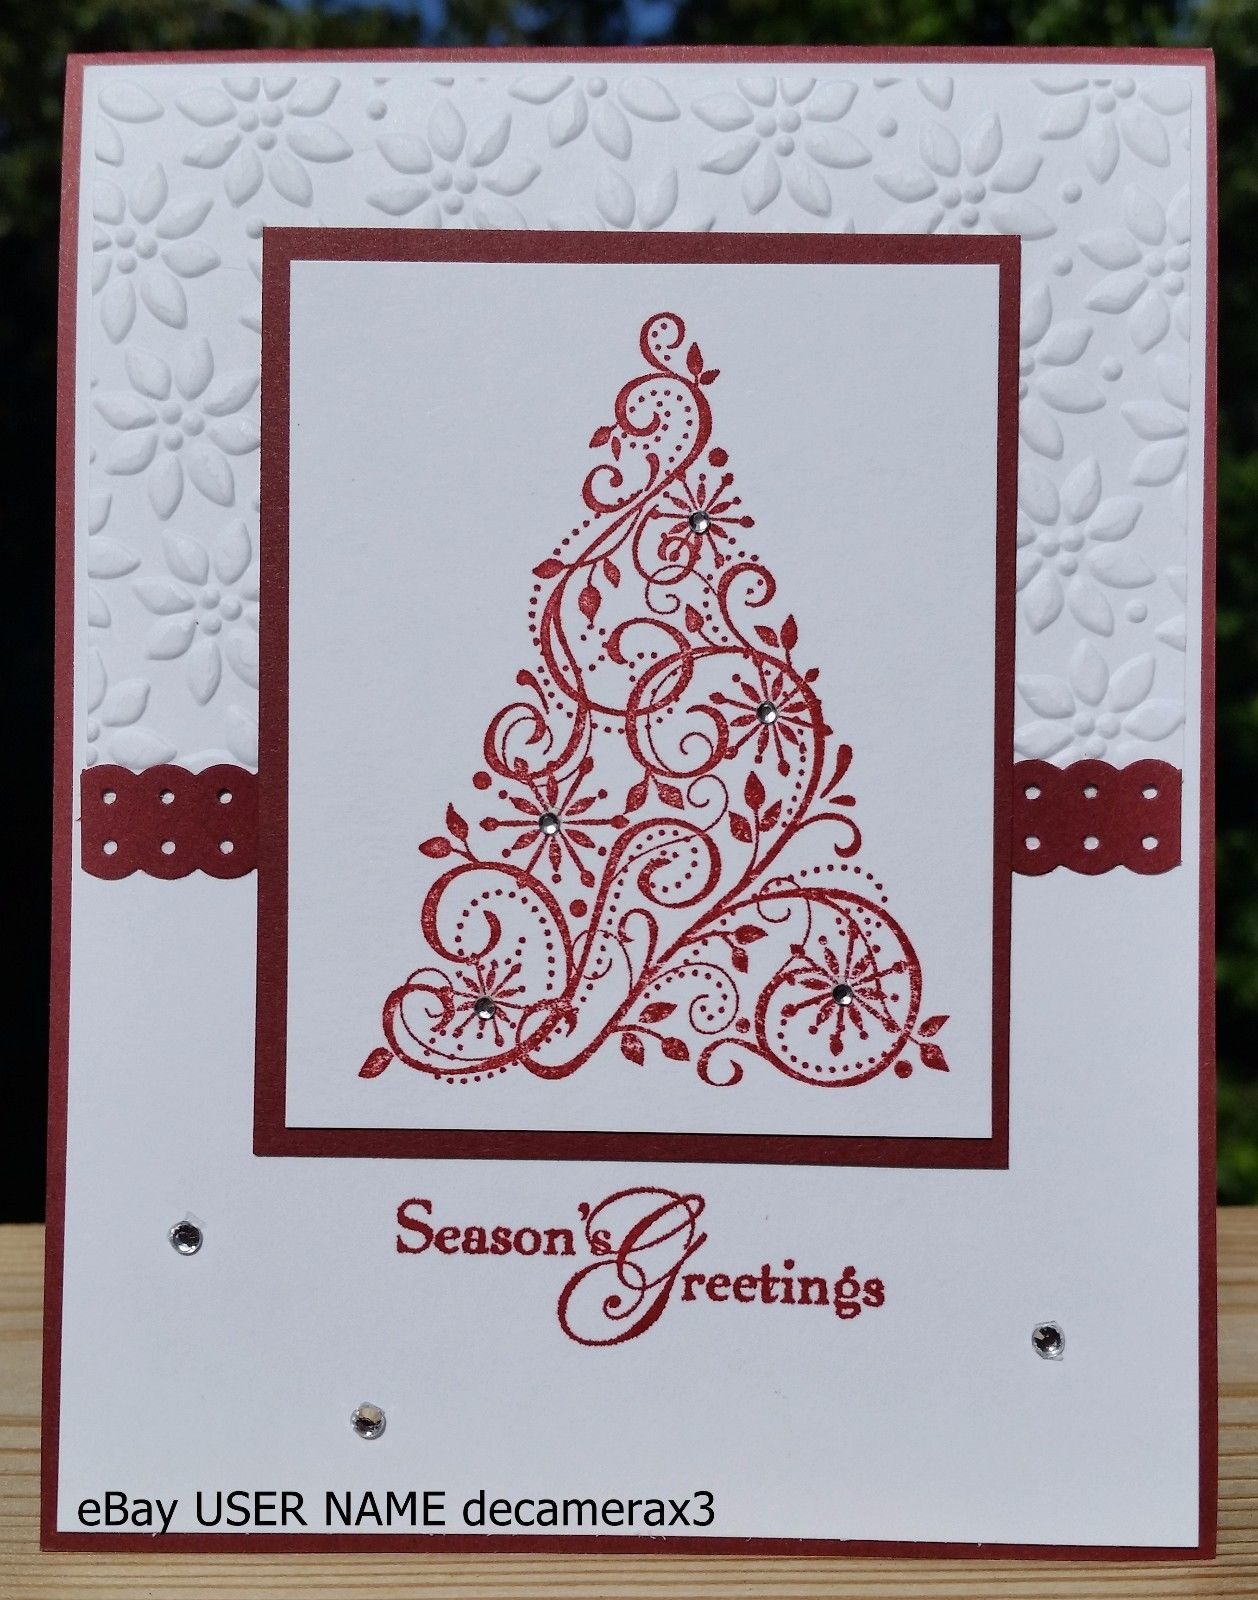 Christmas Handmade Card Kit Set Of 4 Stampin Up Snow Swirled Handmade Card Kits Stamped Christmas Cards Cards Handmade